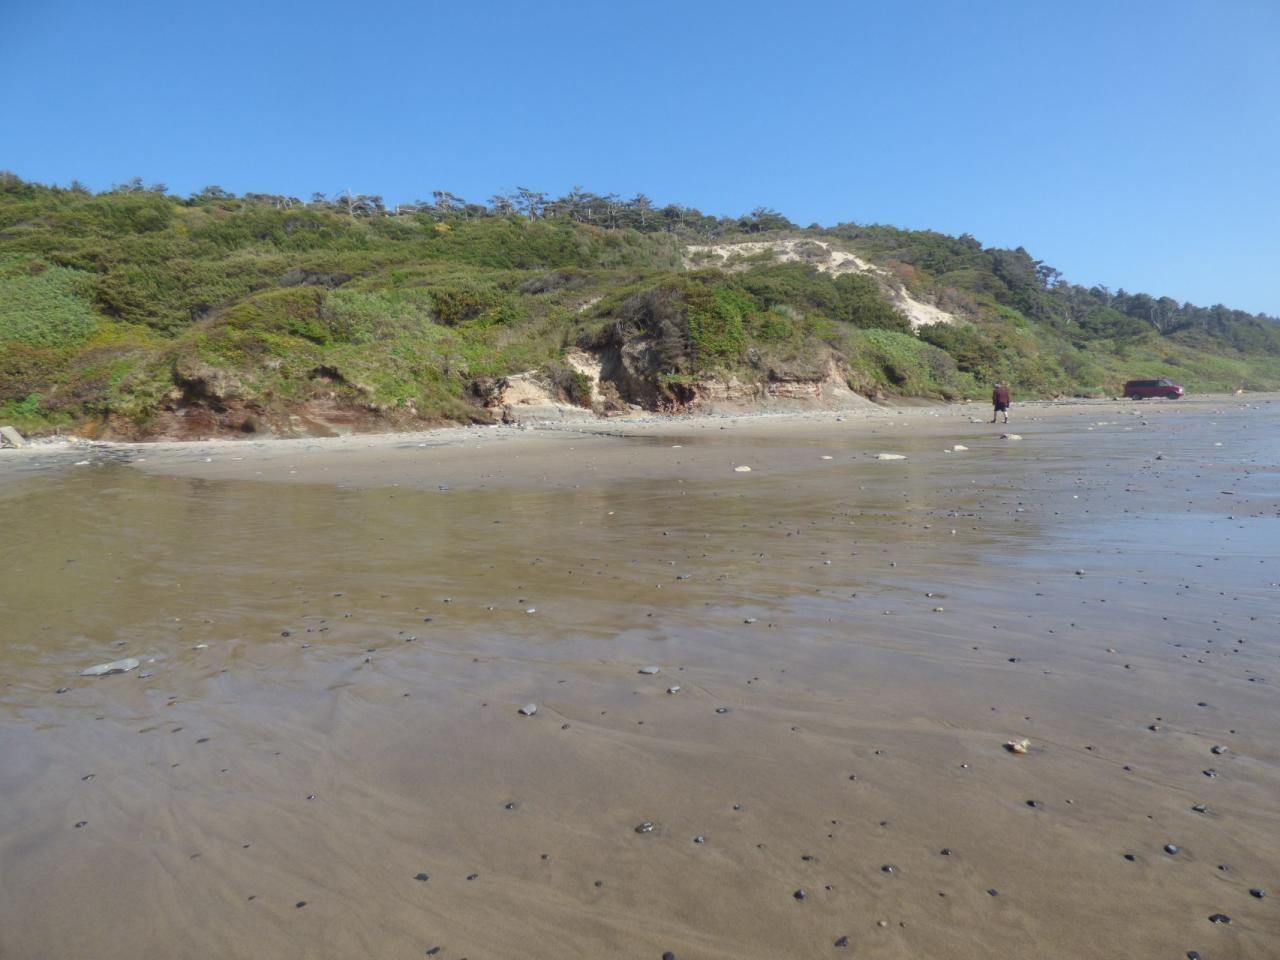 shore erosion